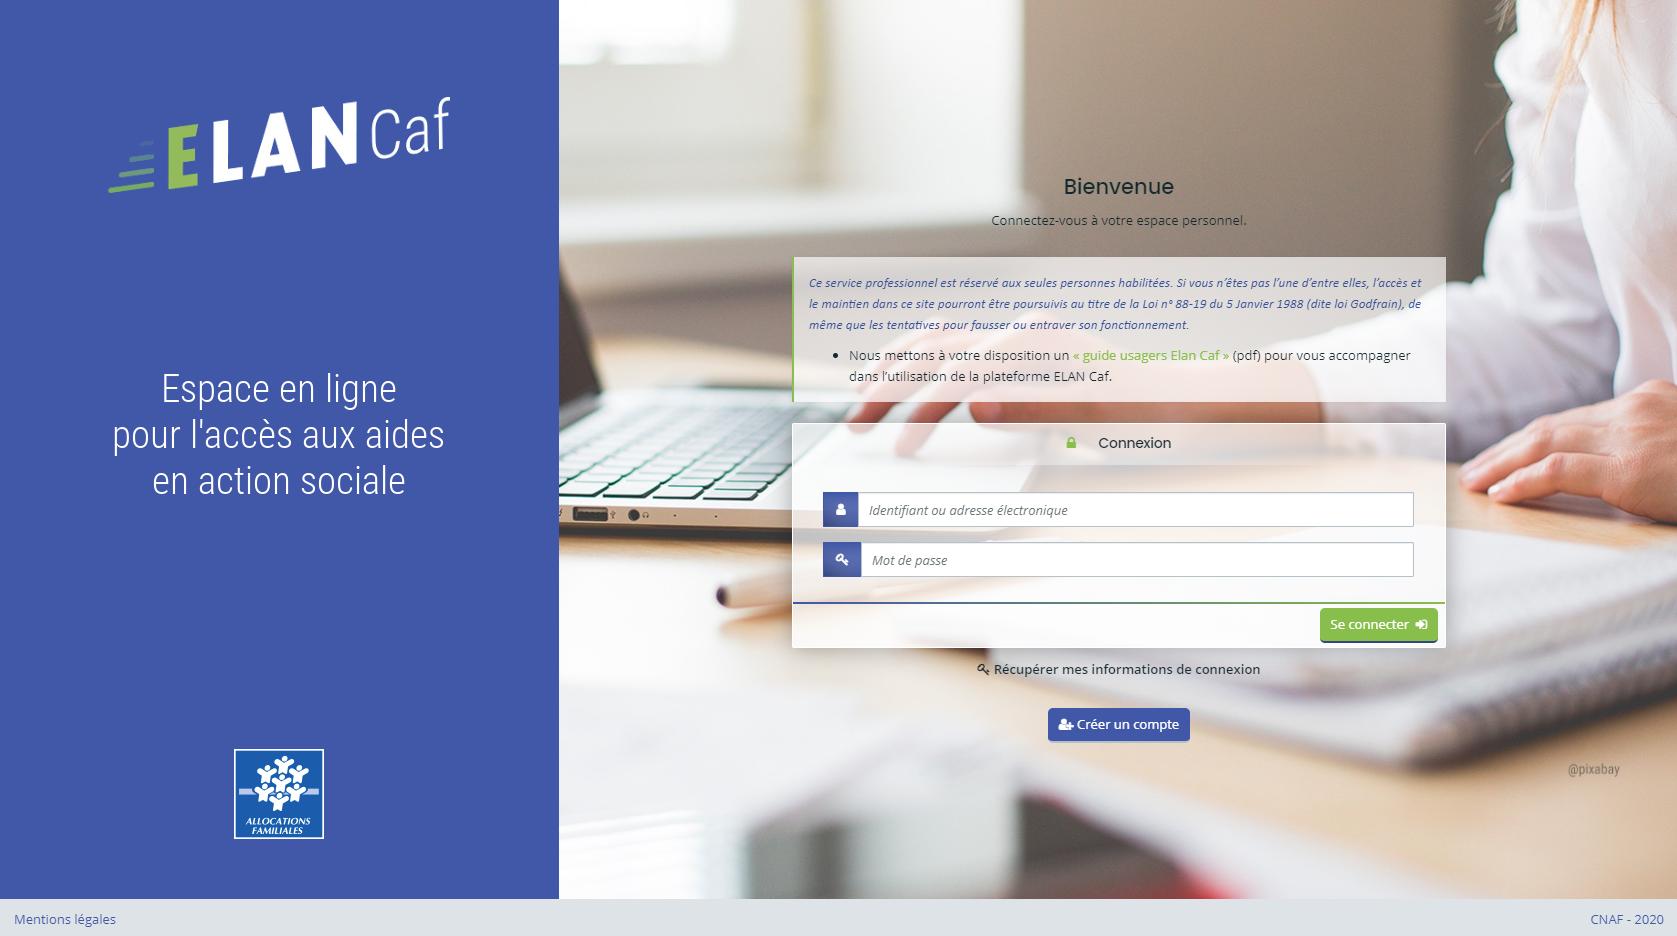 ELAN-CAF-Screenshot-Portail-des-aides-MGDIS-CNAF-CAF